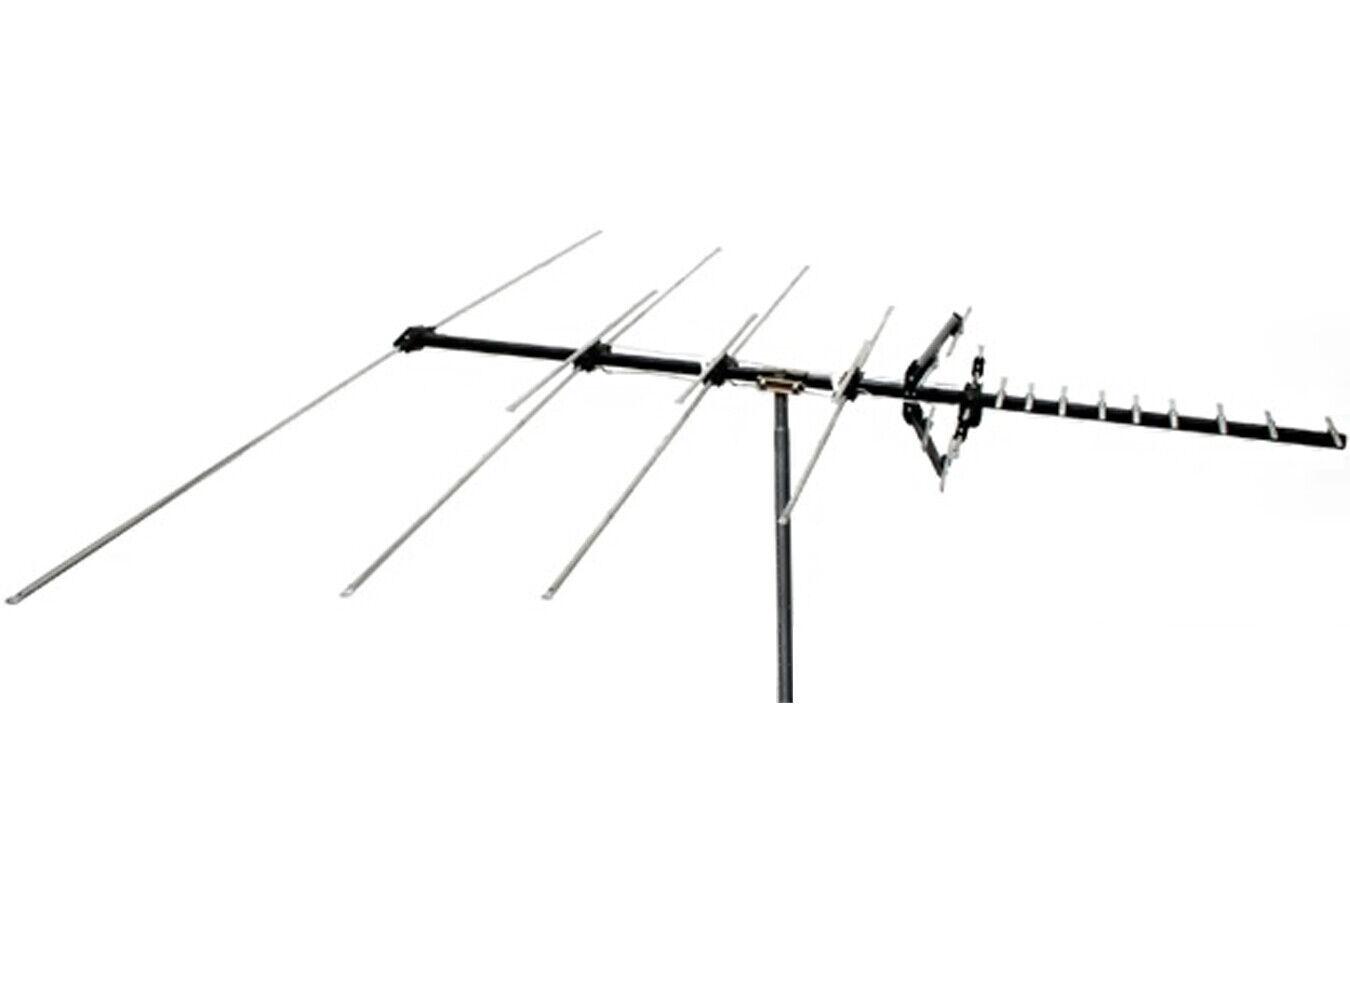 CM-5018 channelmasteroutlet Channel Master Masterpiece 60 Directional Outdoor TV Antenna Heavy Duty CM-5018